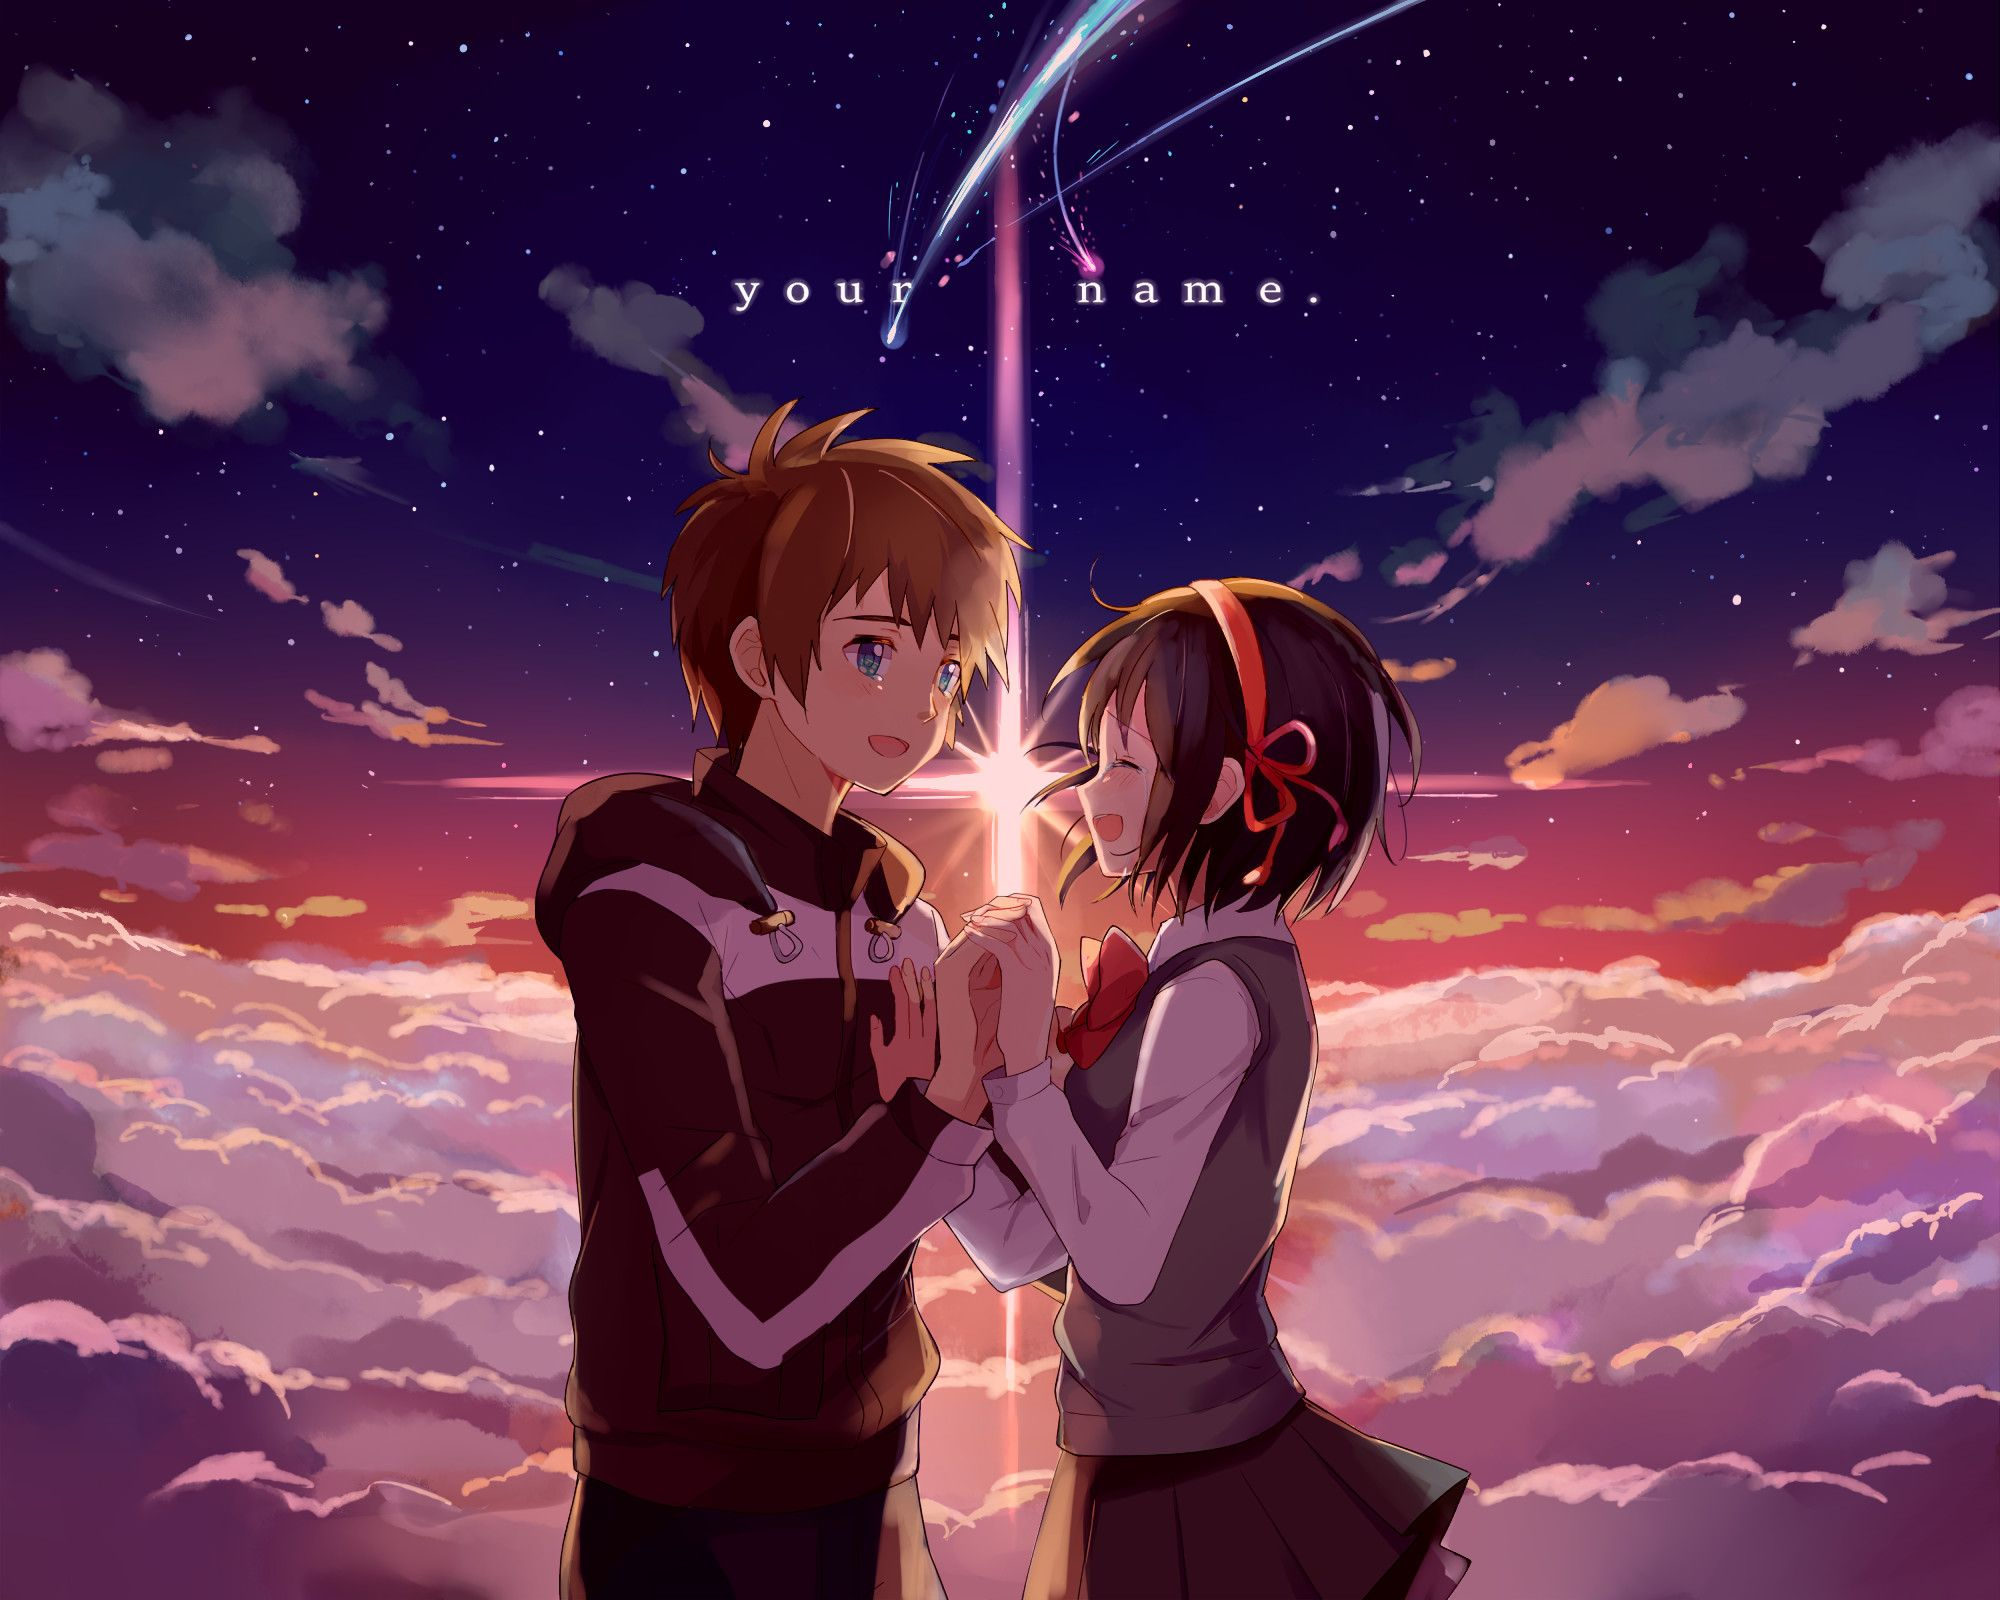 Anime Romance Love Wallpapers - Top Free Anime Romance ...